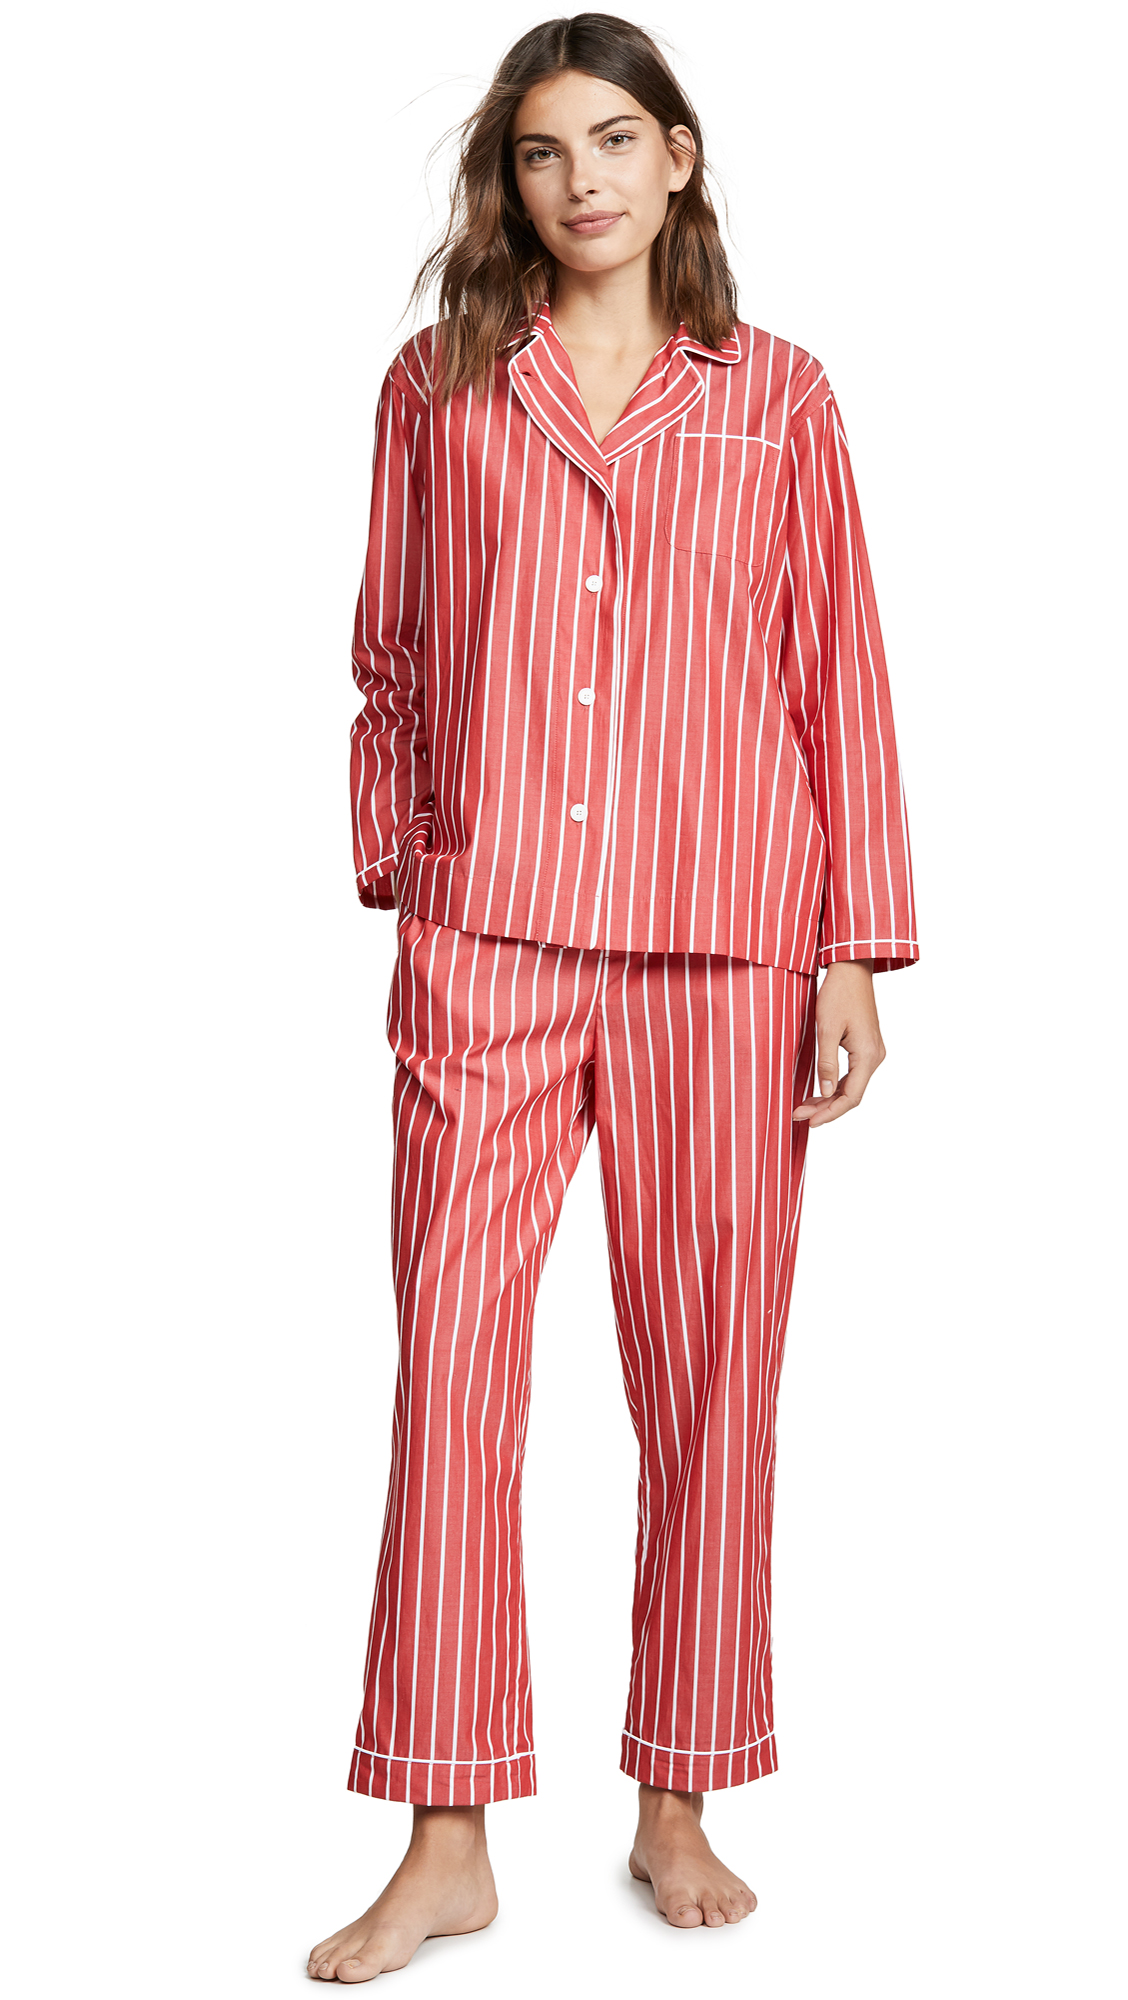 SLEEPY JONES Bishop Pajama Set in Red/White